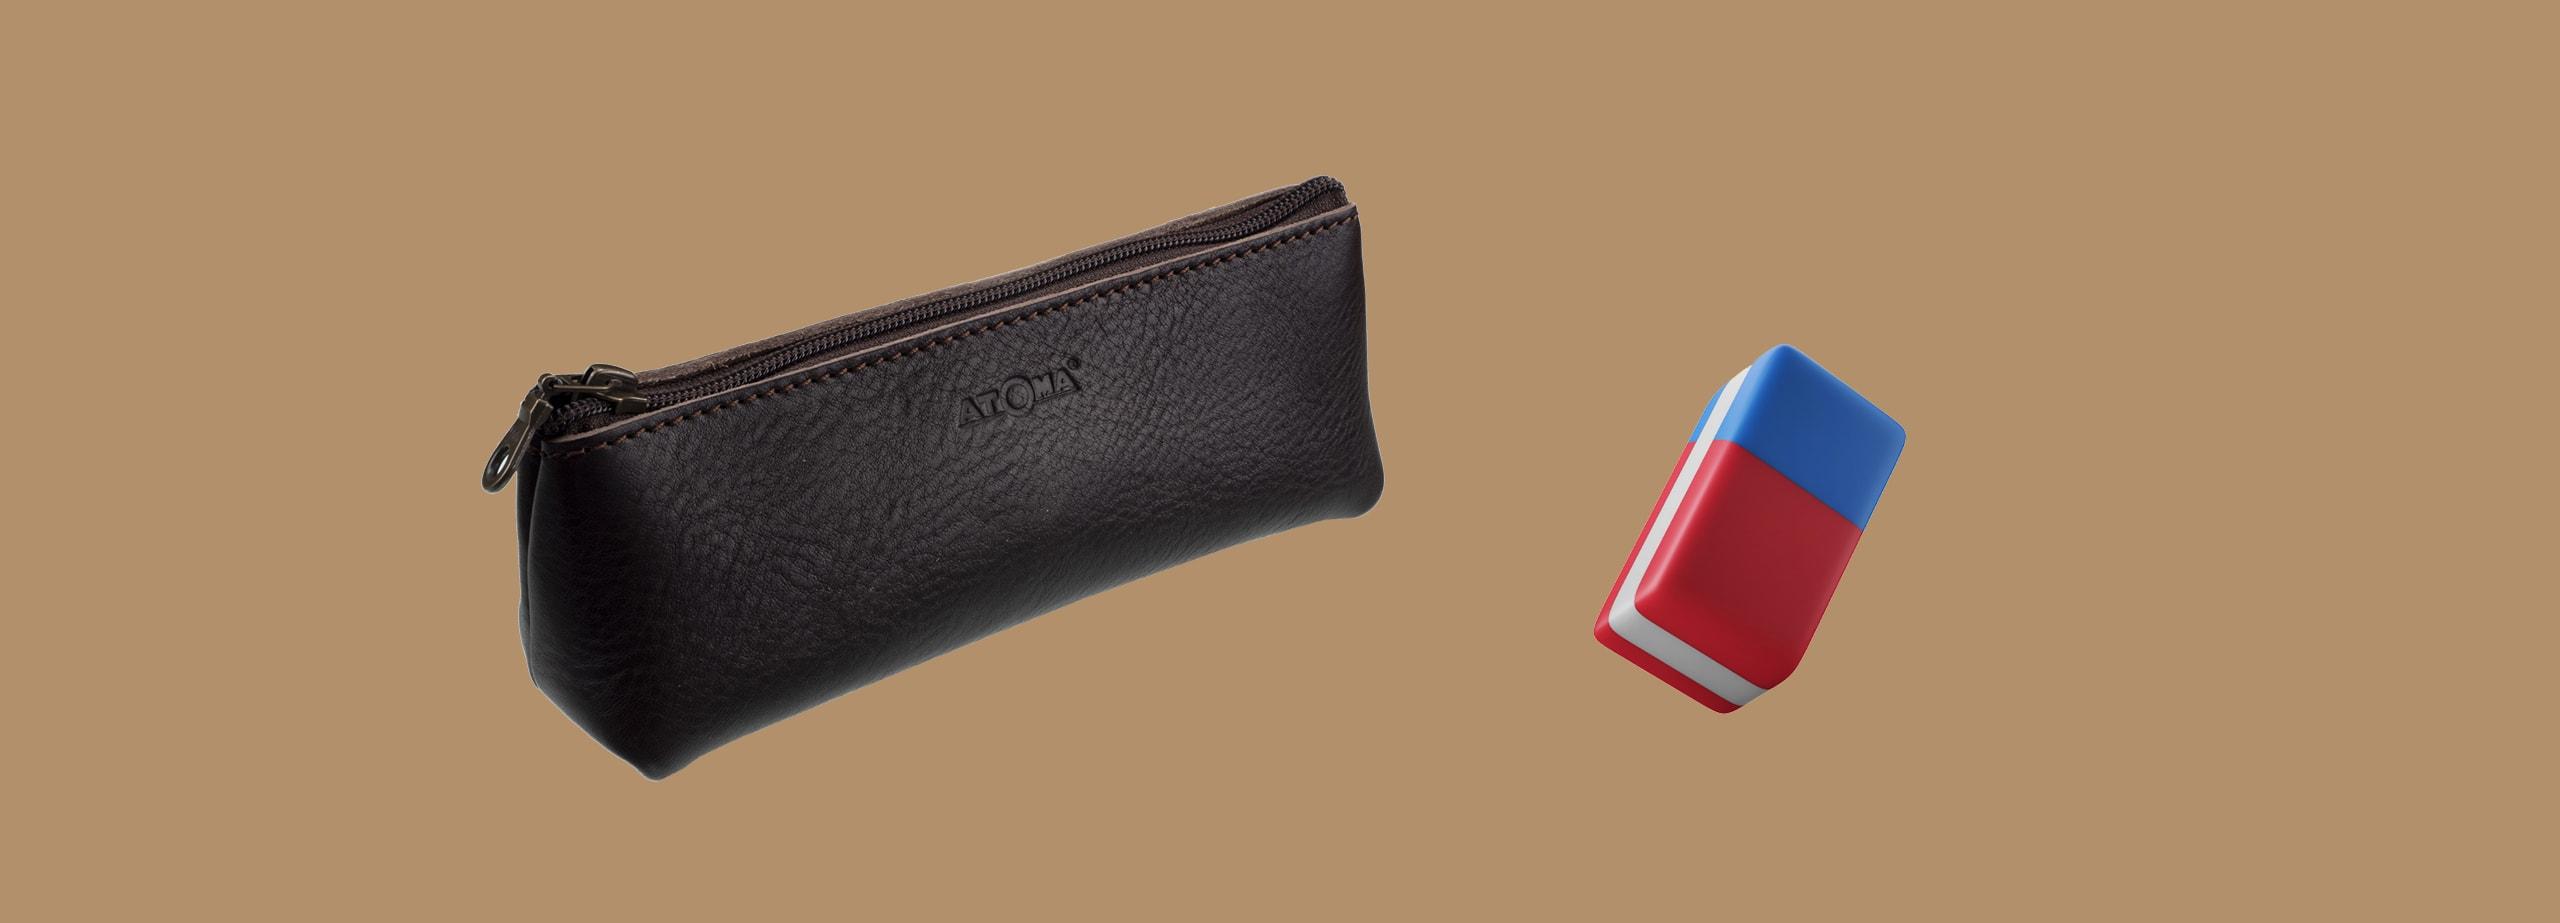 Atoma - Pencil cases